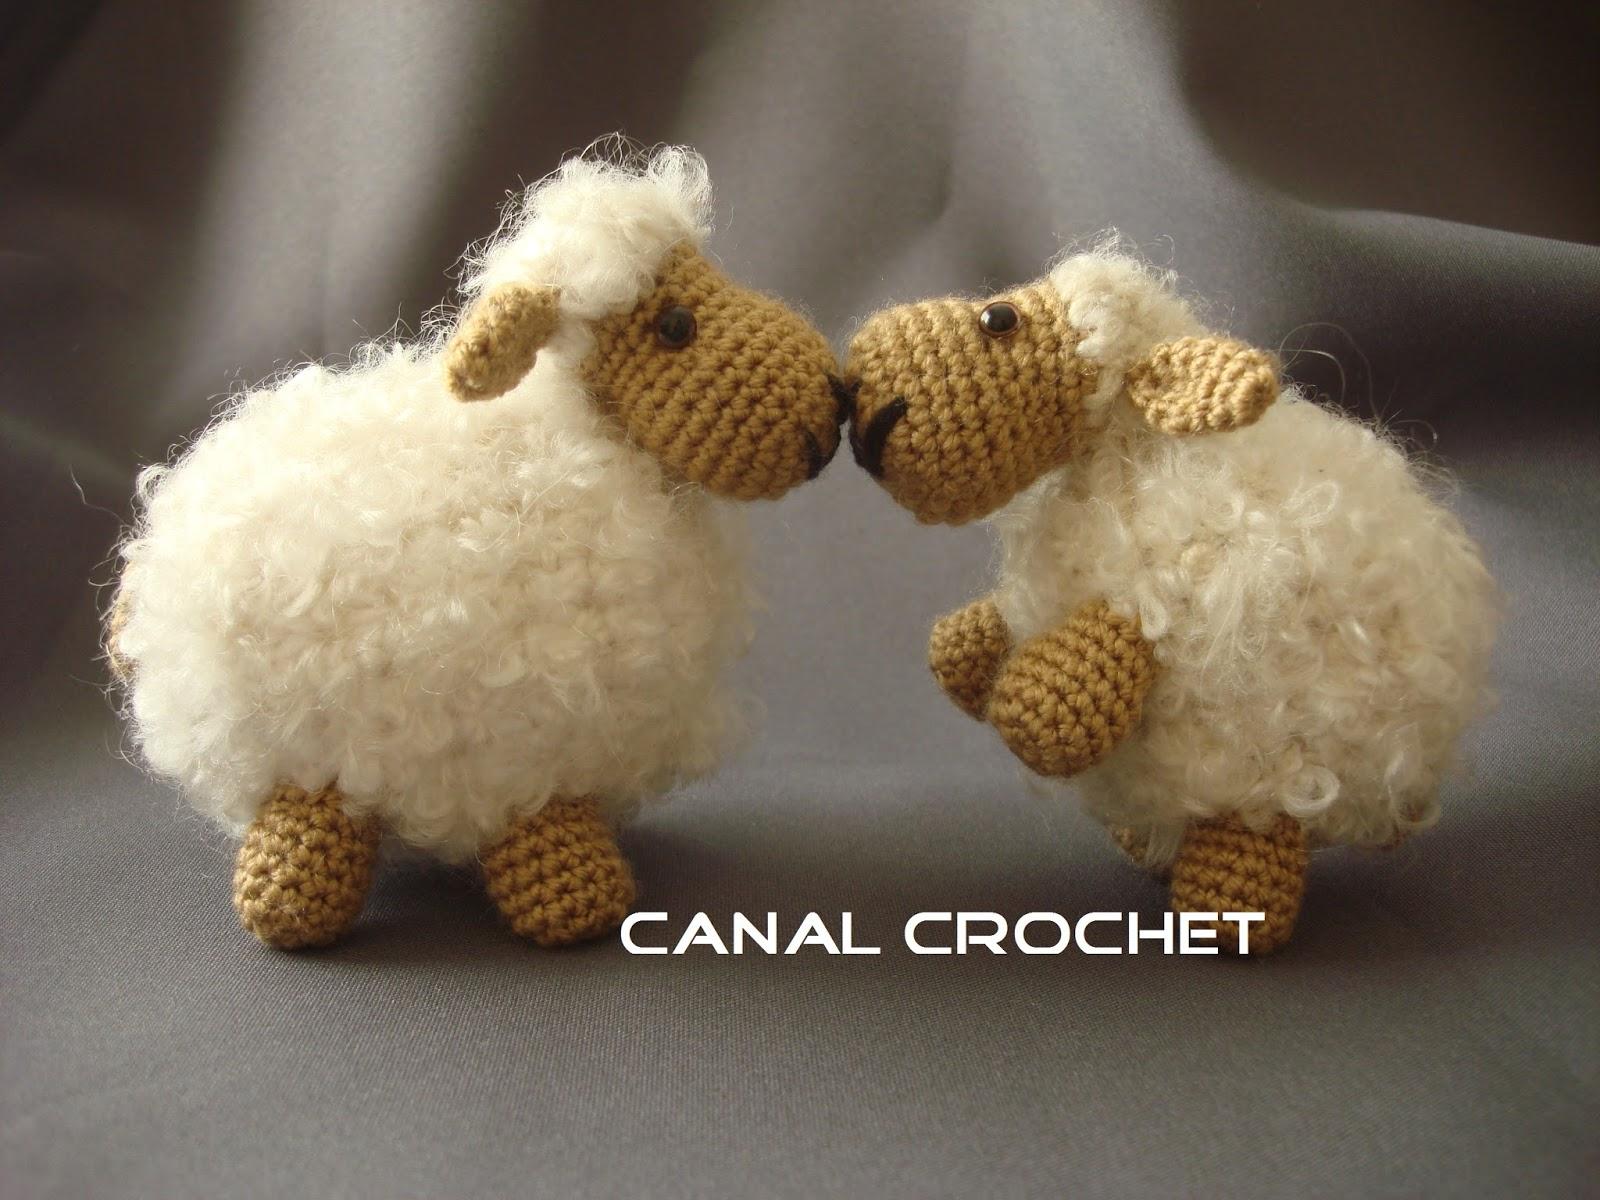 Osito Amigurumi Tutorial Canal Crochet : CANAL CROCHET: Oveja amigurumi patron libre: